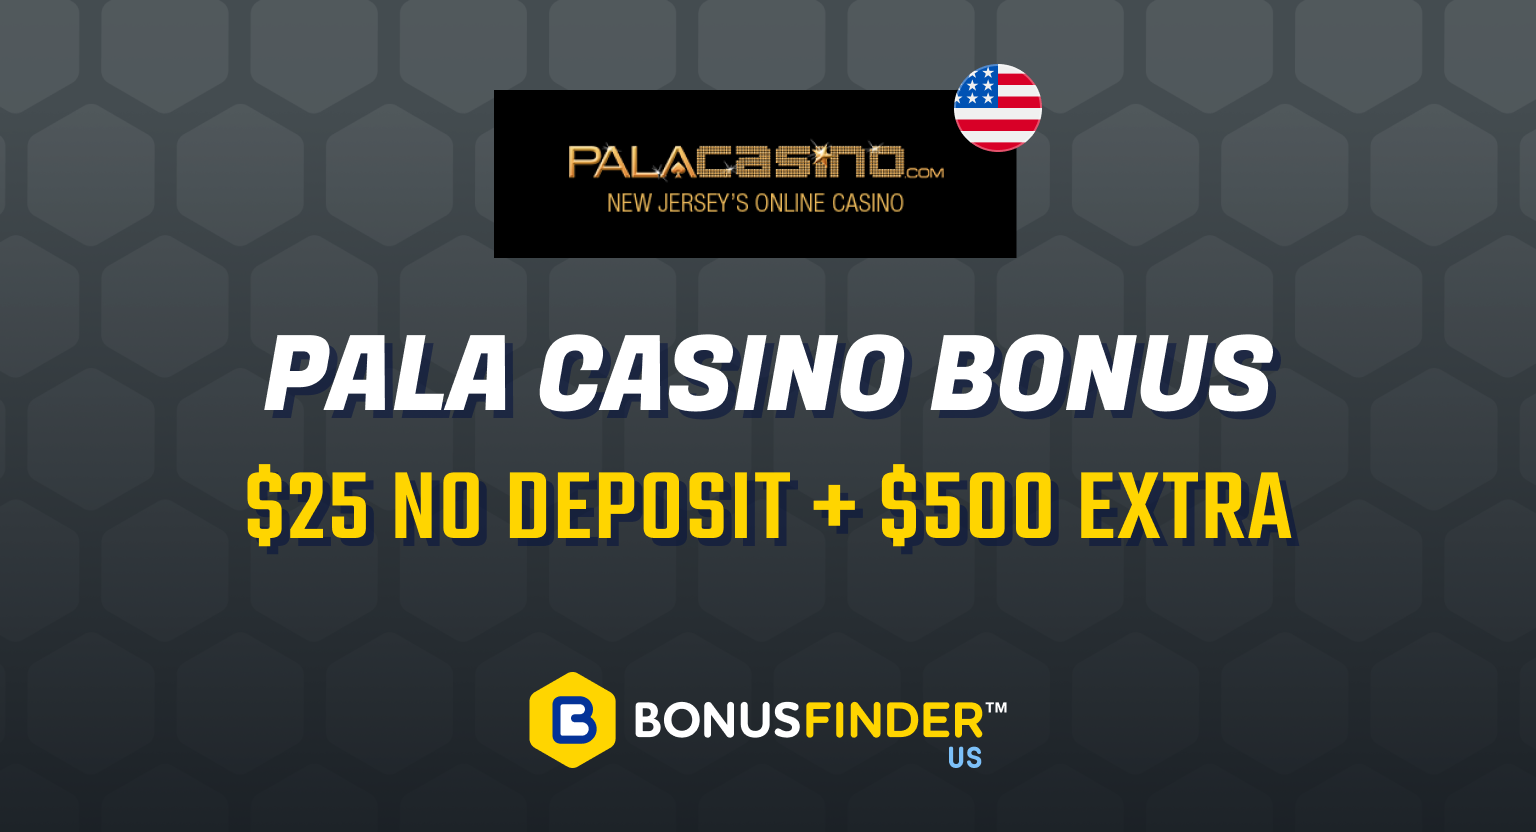 pala casino online bonus